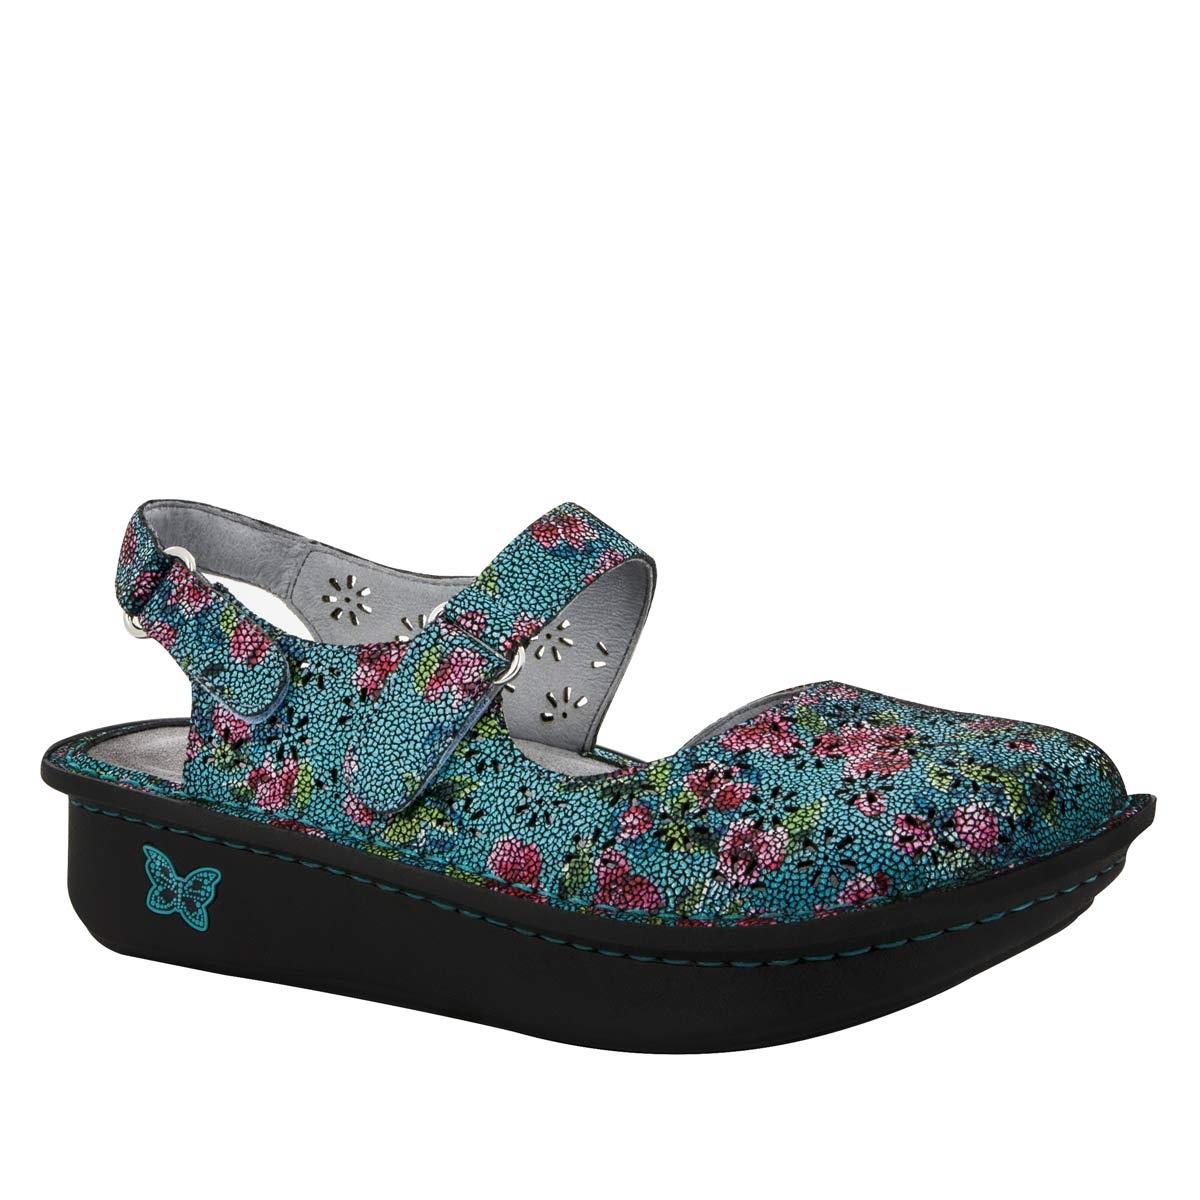 Alegria Shoes Jemma Aqua Flora Sandal FREE Shipping!